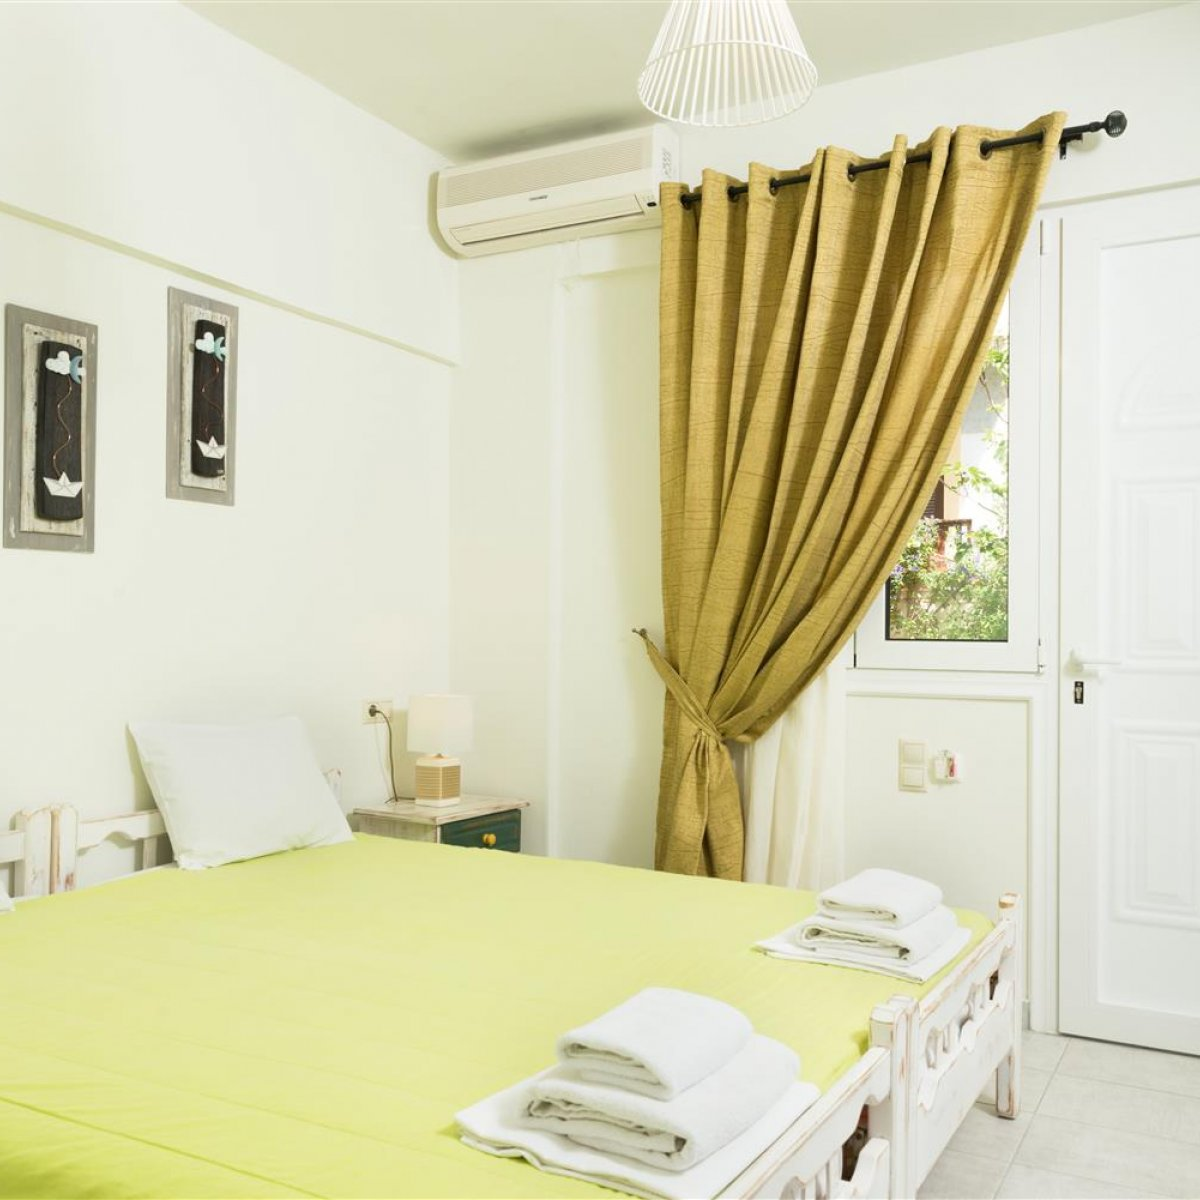 Hotel Sunshine Matala - Alkioni room